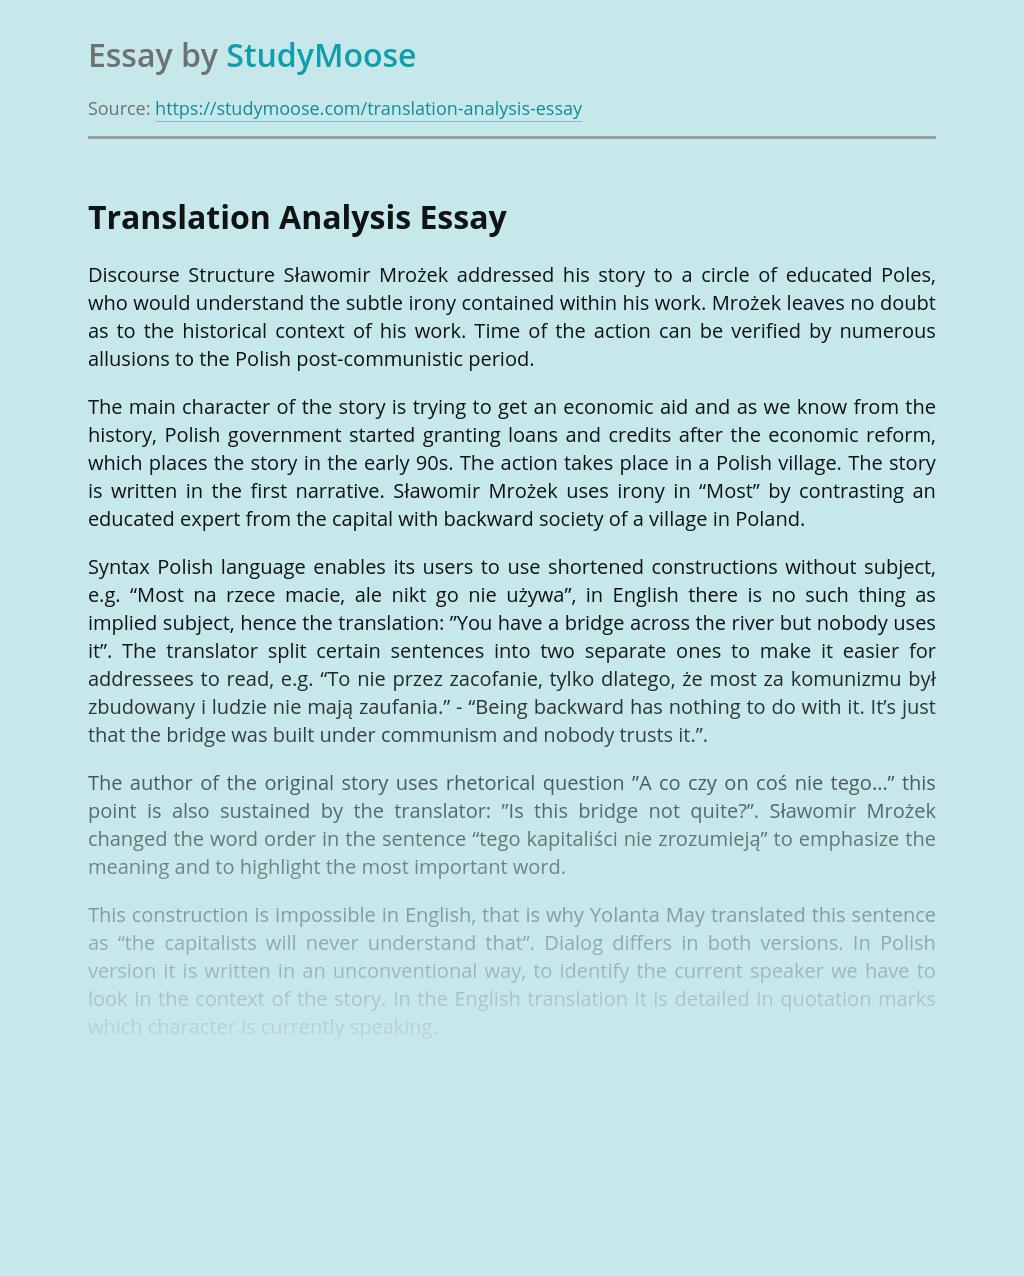 Translation Analysis of Language in Most